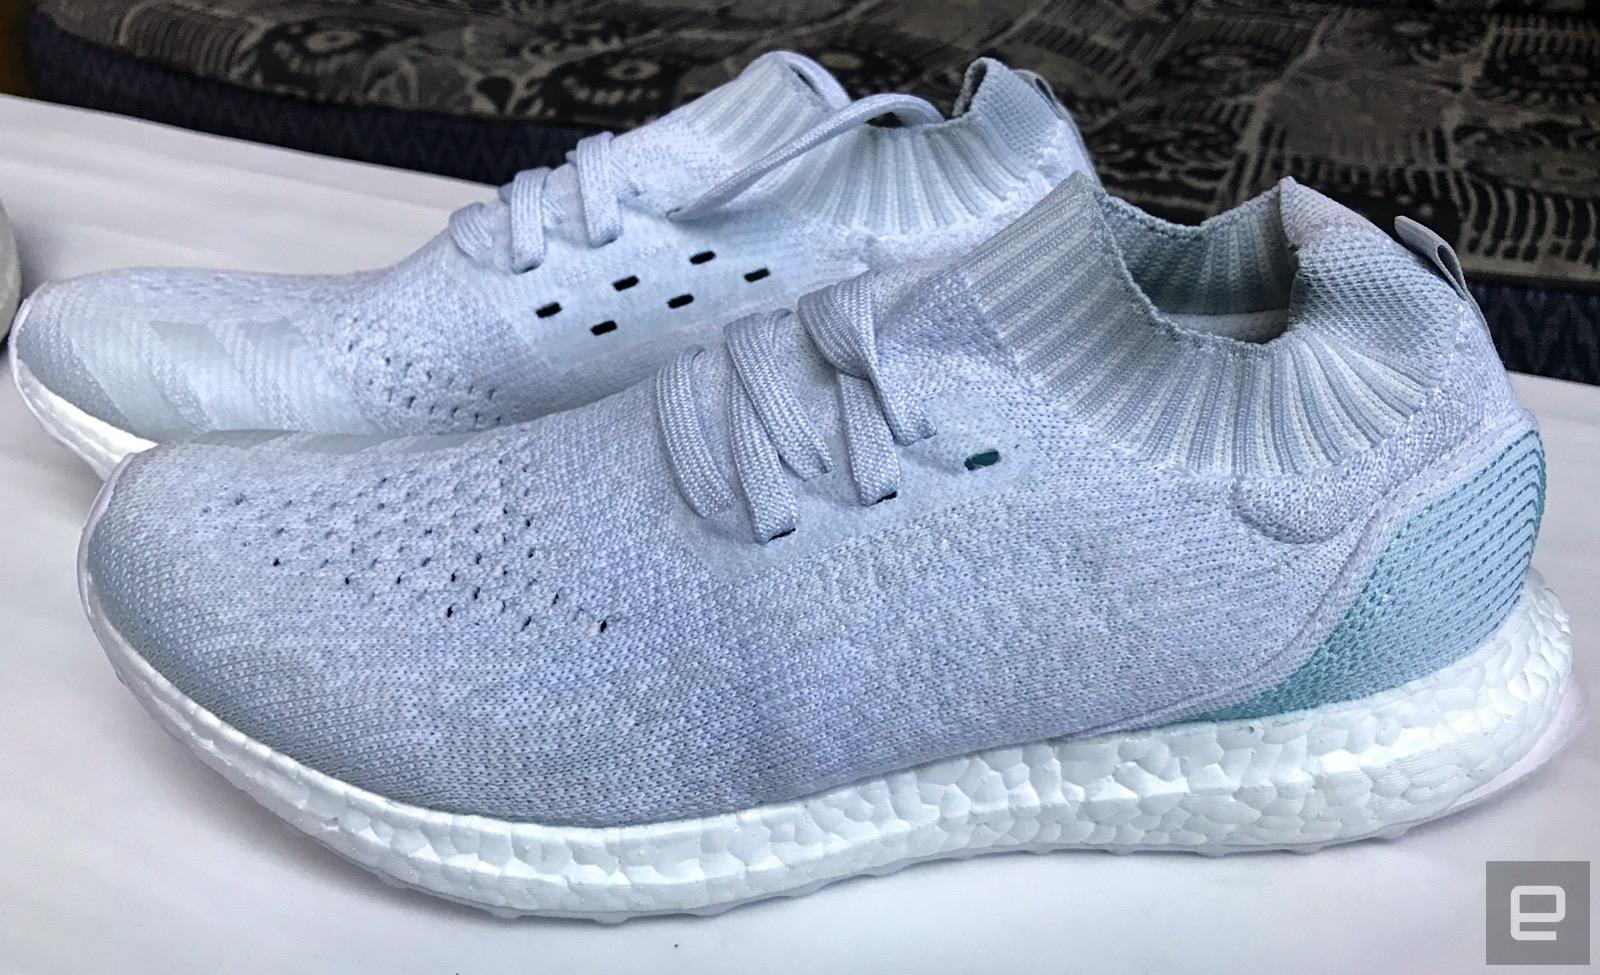 mit Ozeanplastik recycletem Adidas ersten Schuh verkauft 8PwknO0X